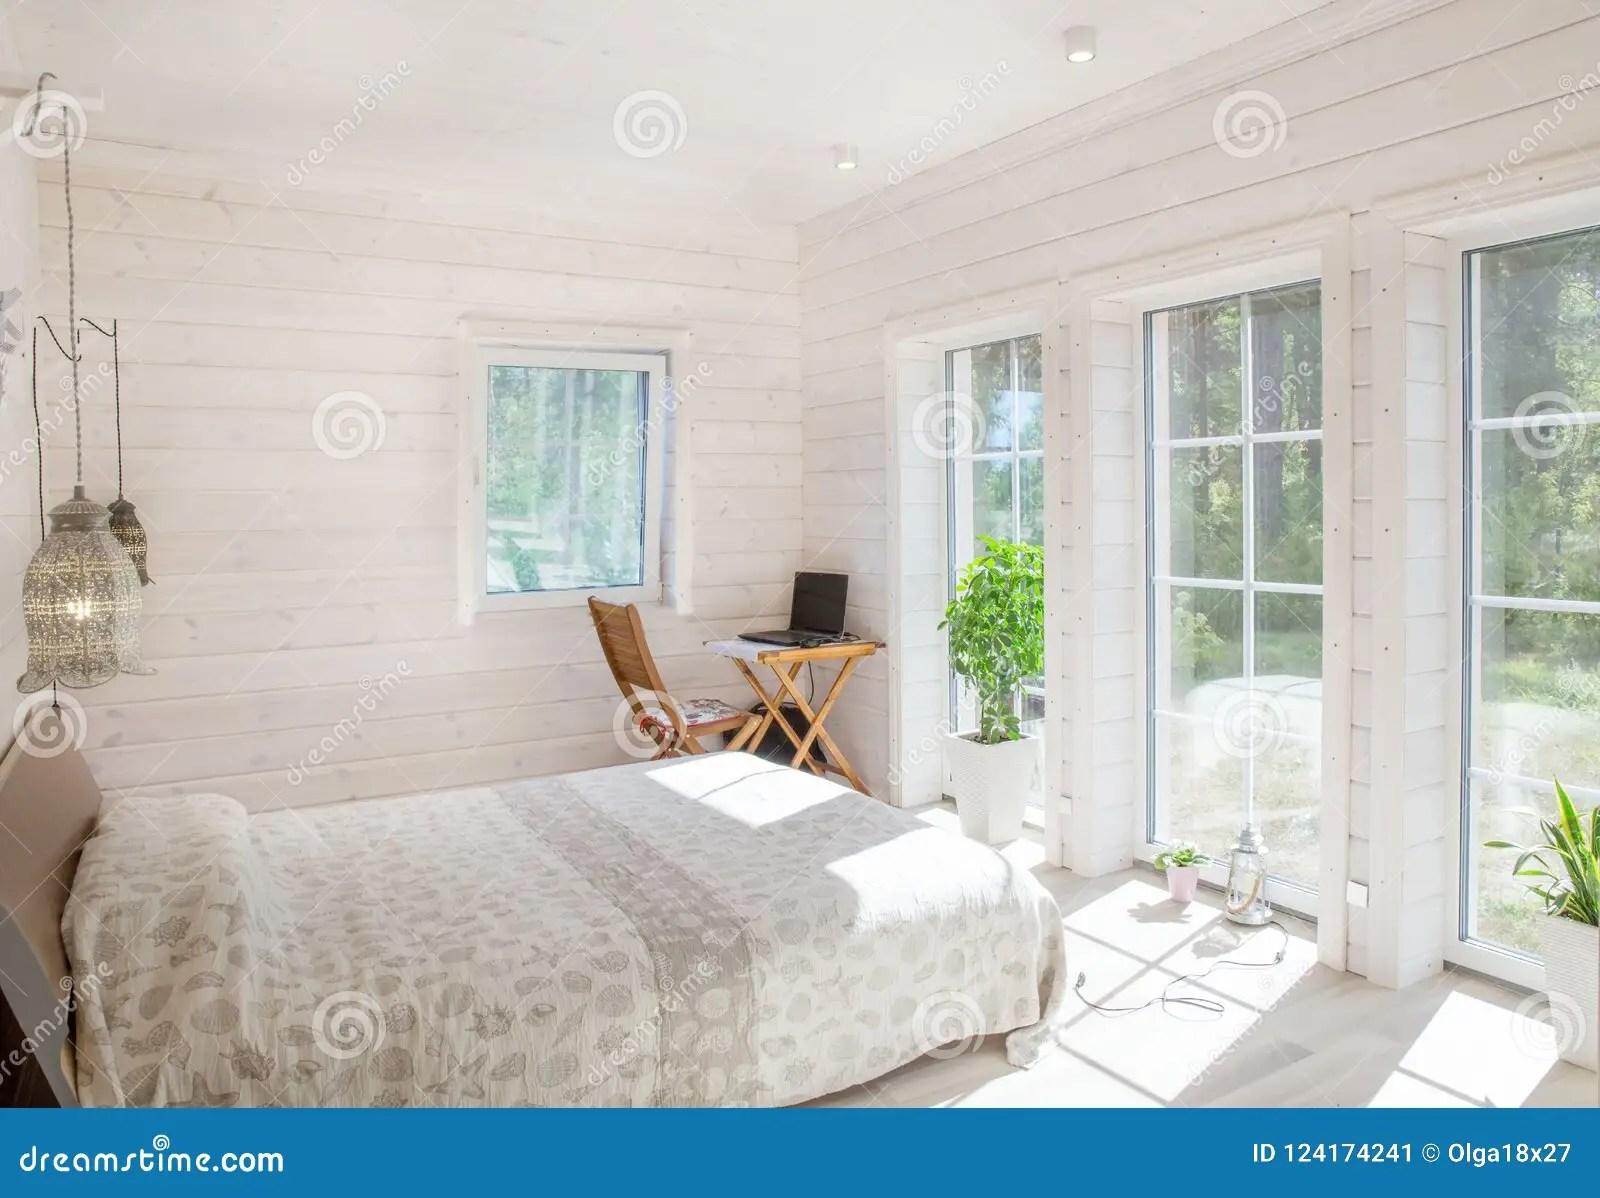 Bright And Comfortable Bedroom Interior Design In ... on Comfortable Bedroom Ideas  id=18871